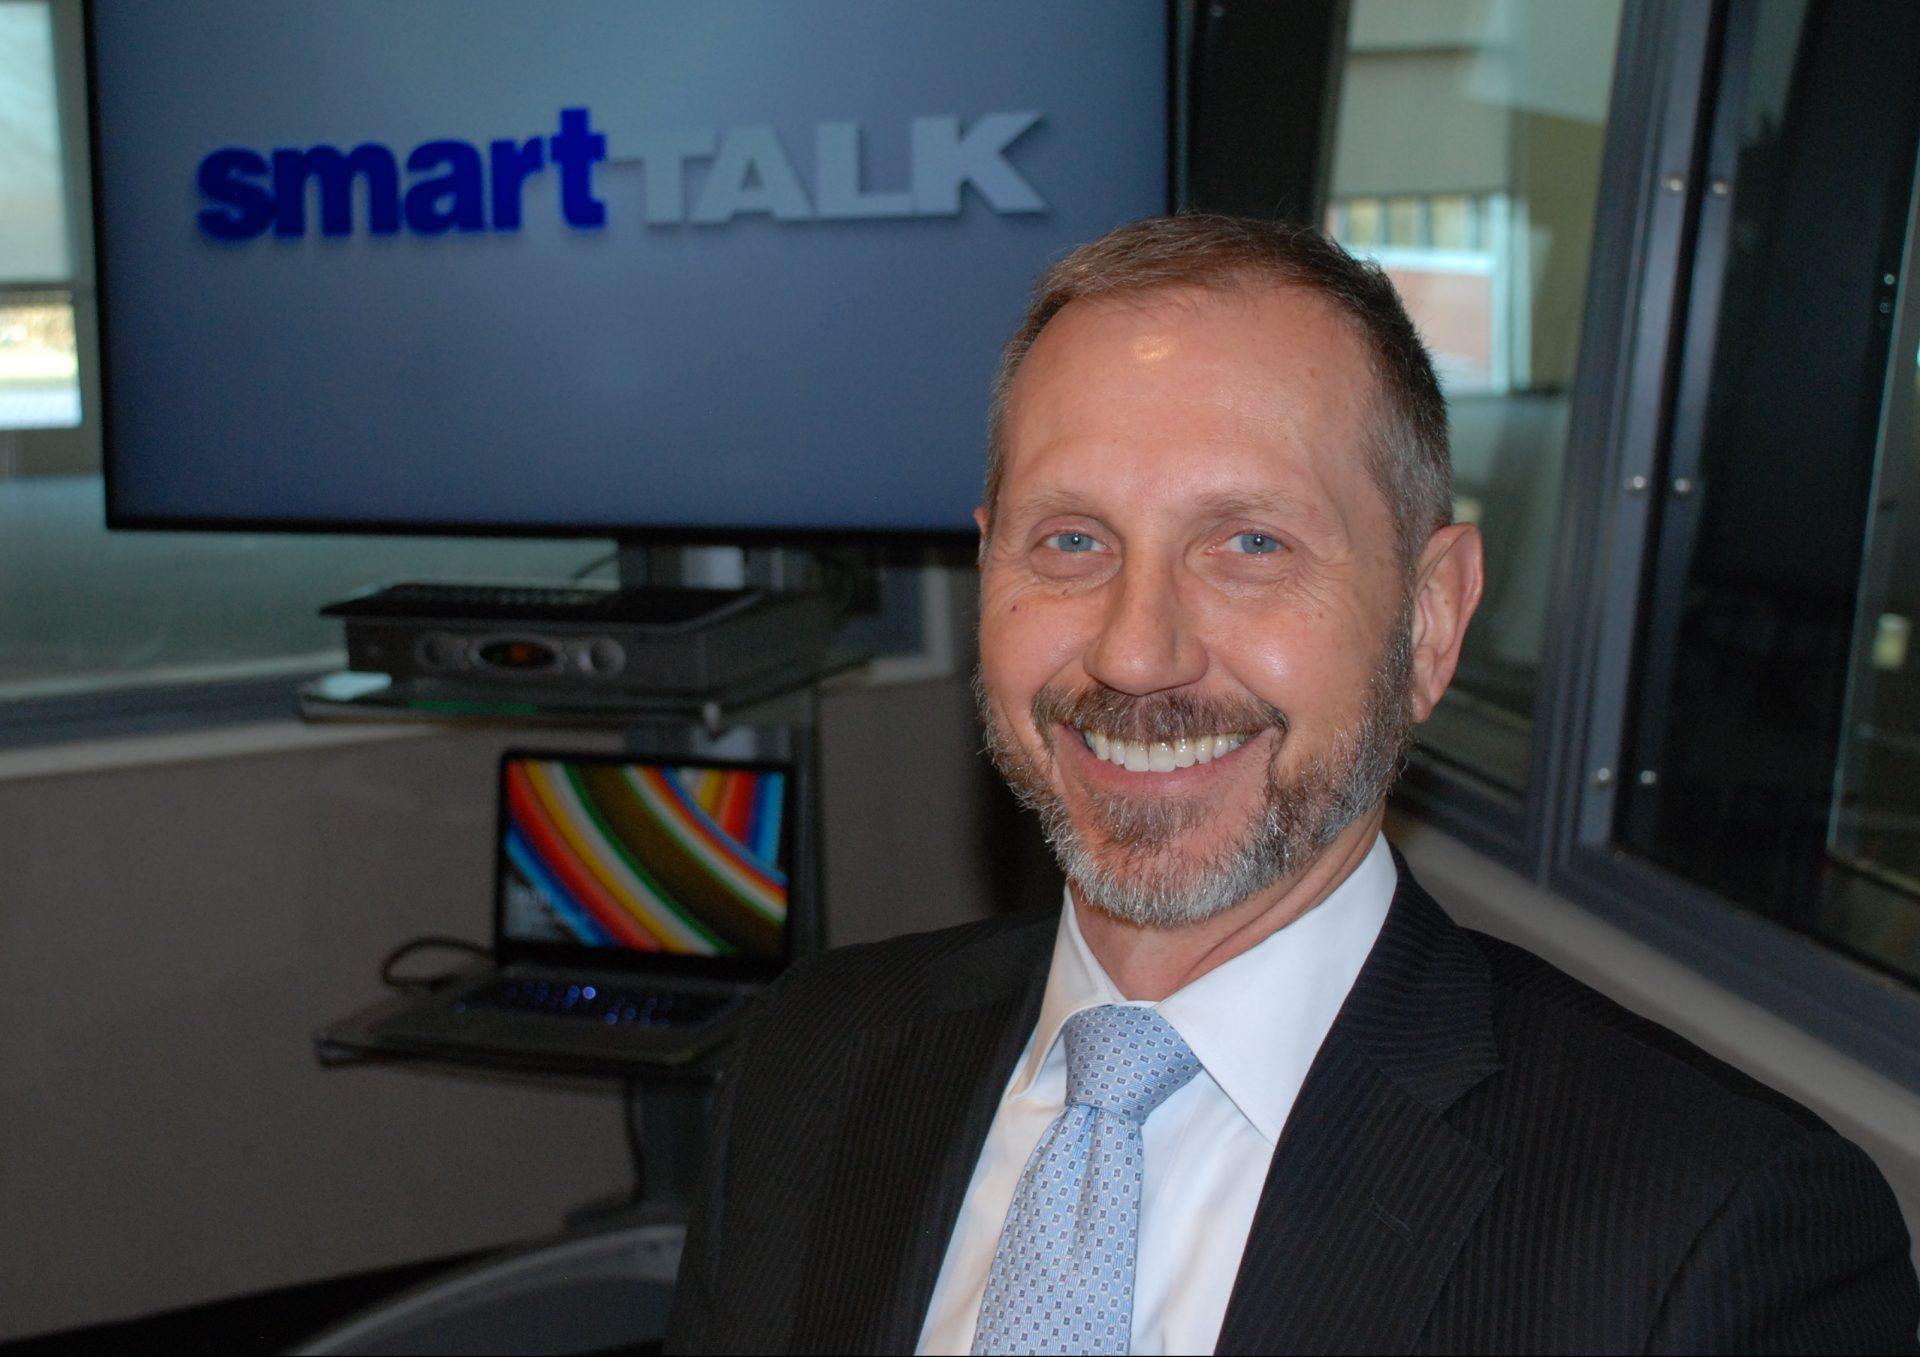 Berwood Yost appears on Smart Talk on January 30, 2020.